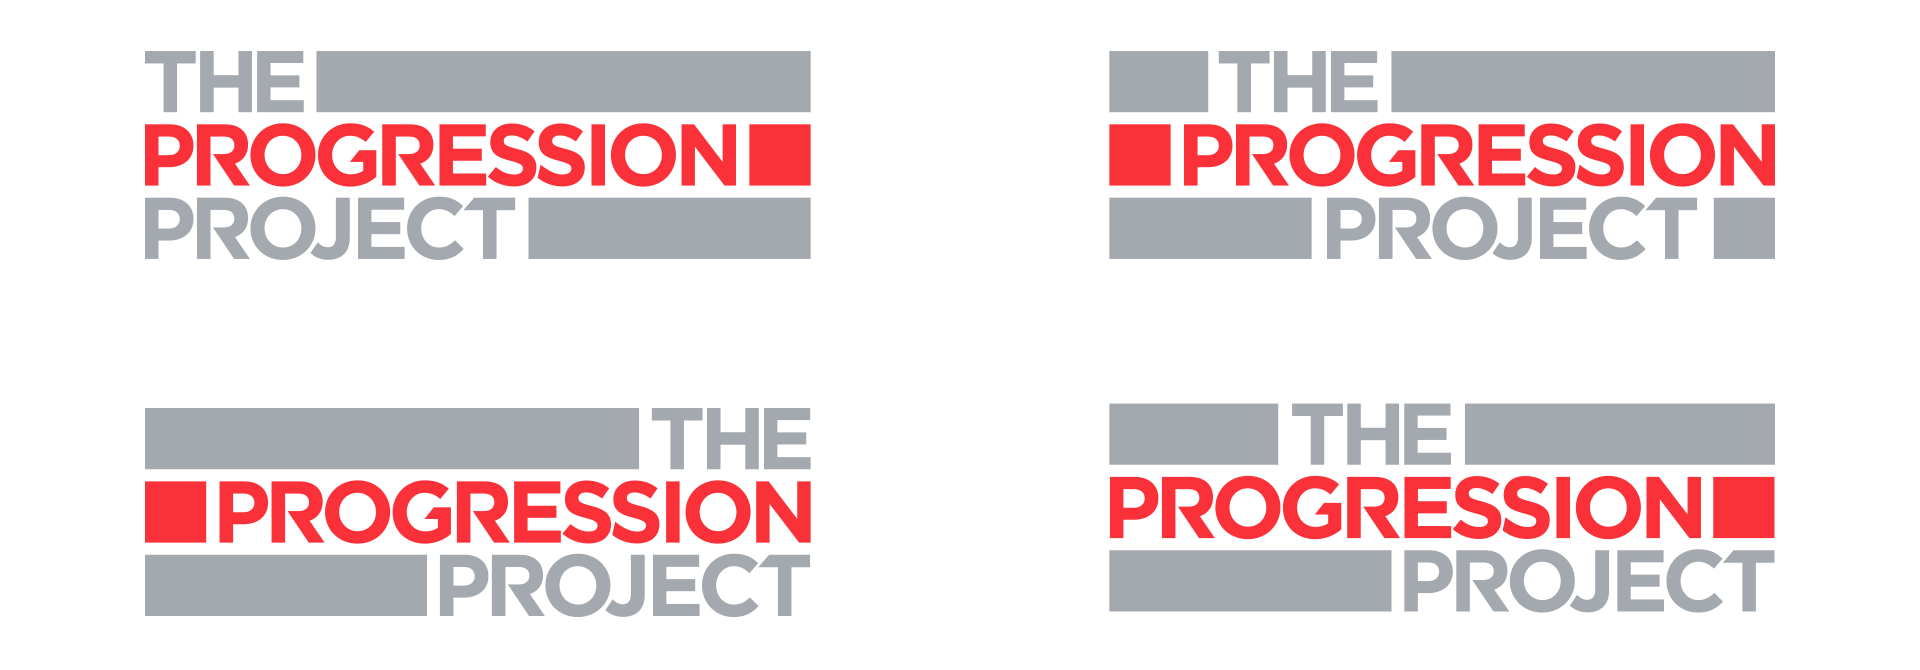 tpp_logo_variations.png